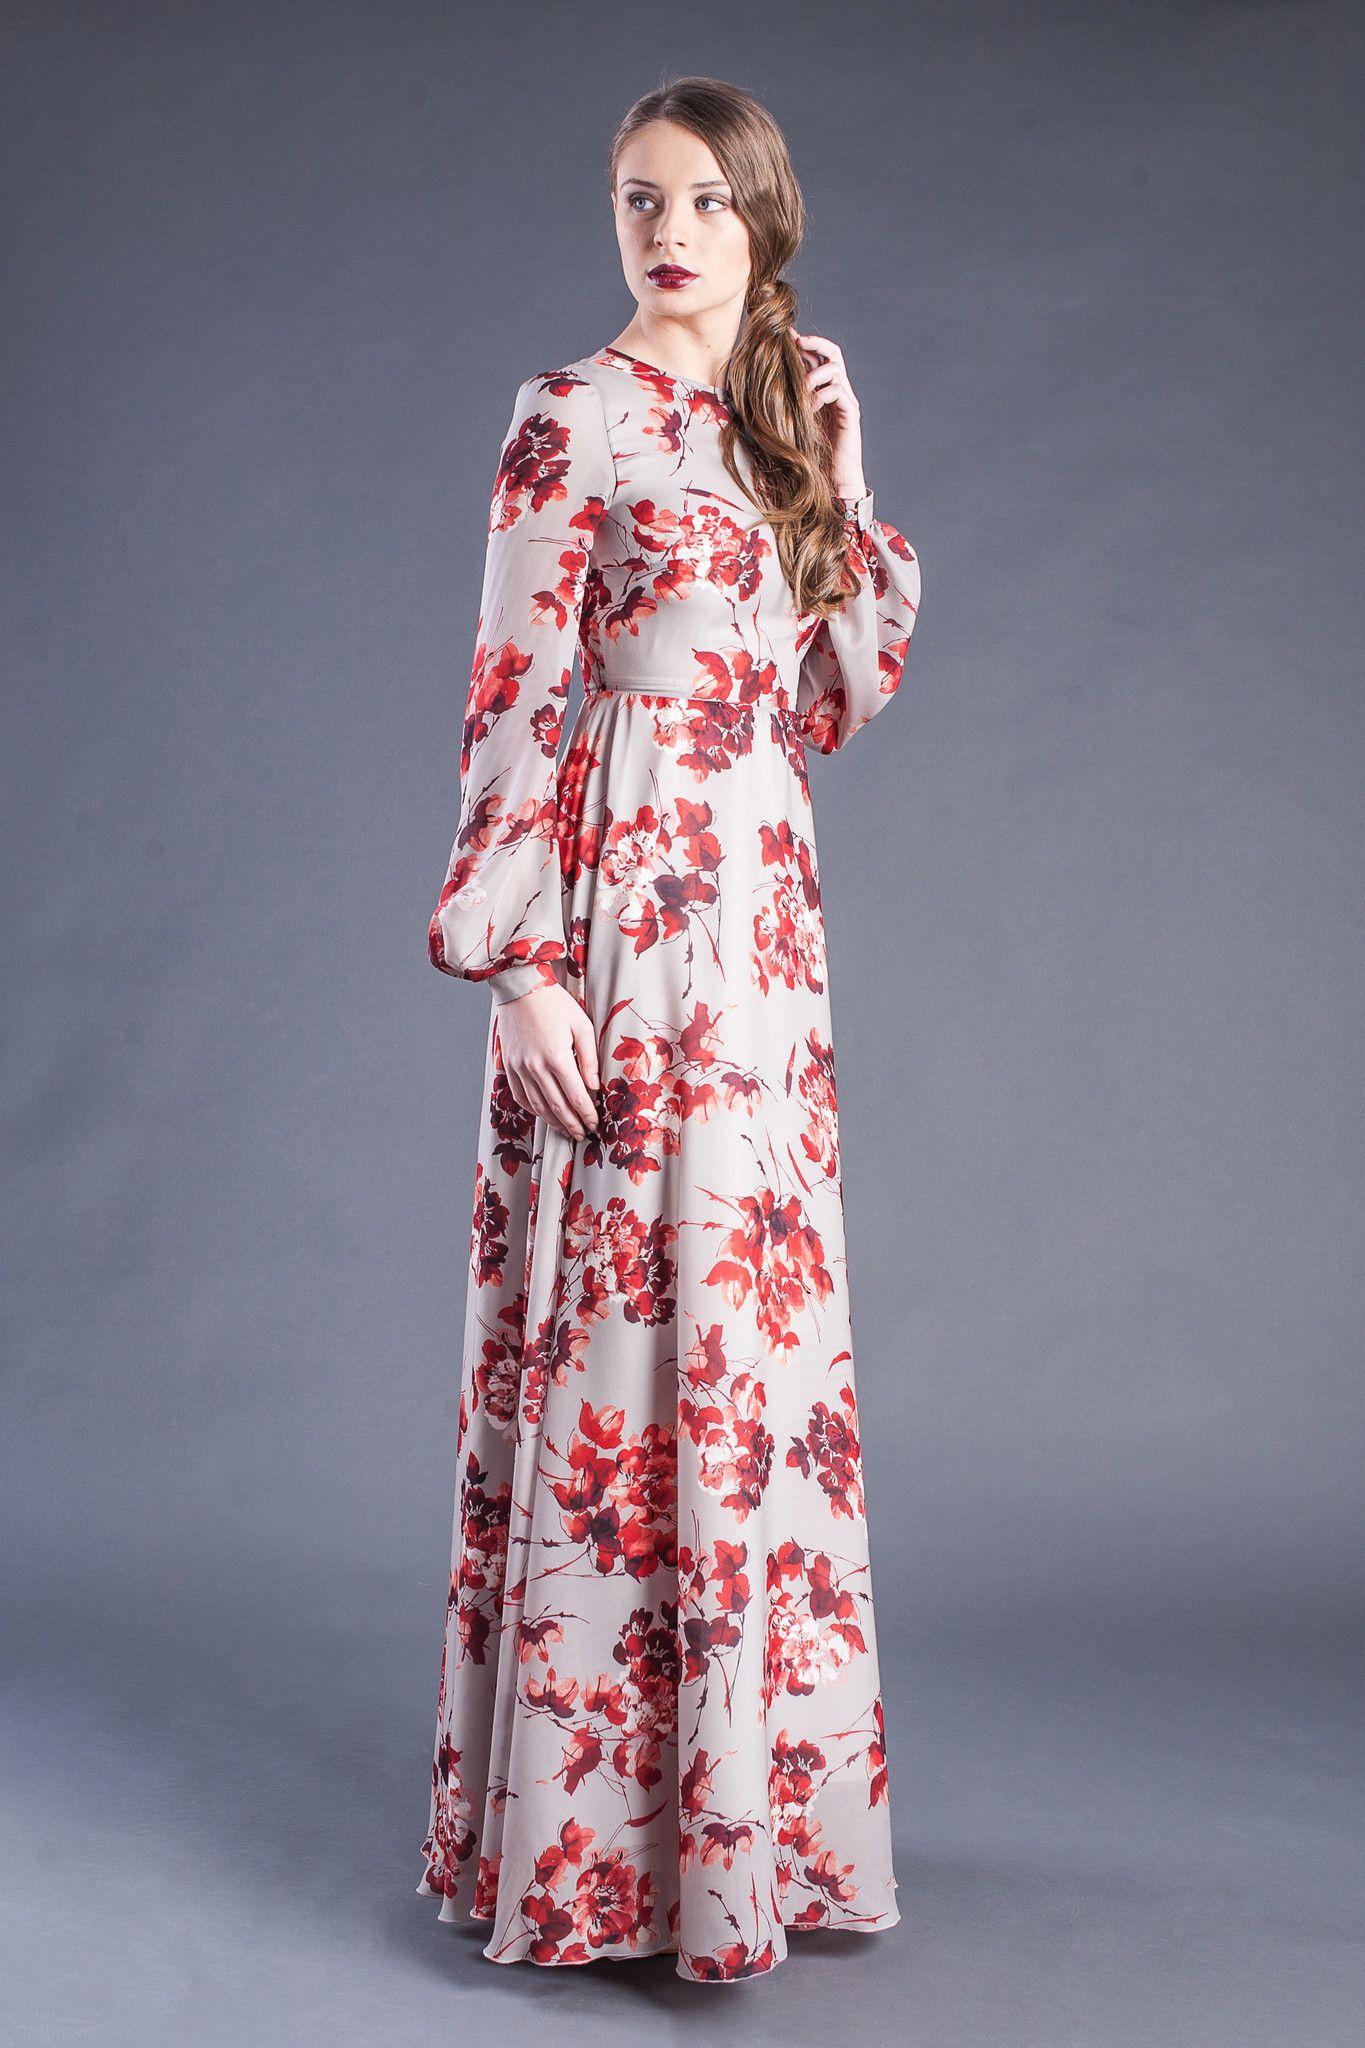 cc8ec0ff8765 Modest Floral Print Long Sleeve Maxi Dress - Modest floor length ...